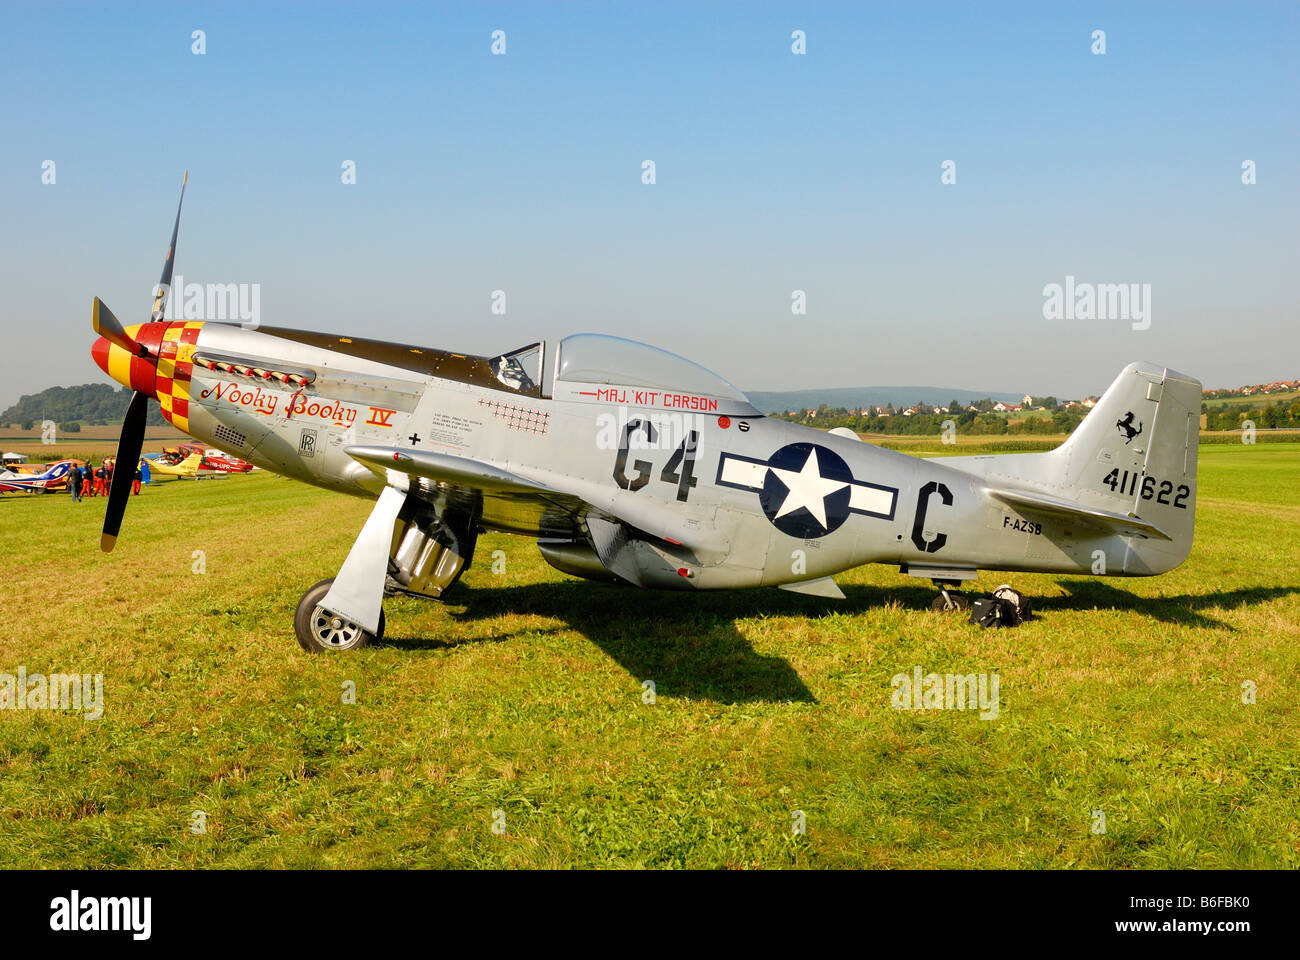 Legendäre amerikanische Jagdflugzeug North American p-51 Mustang Stockbild